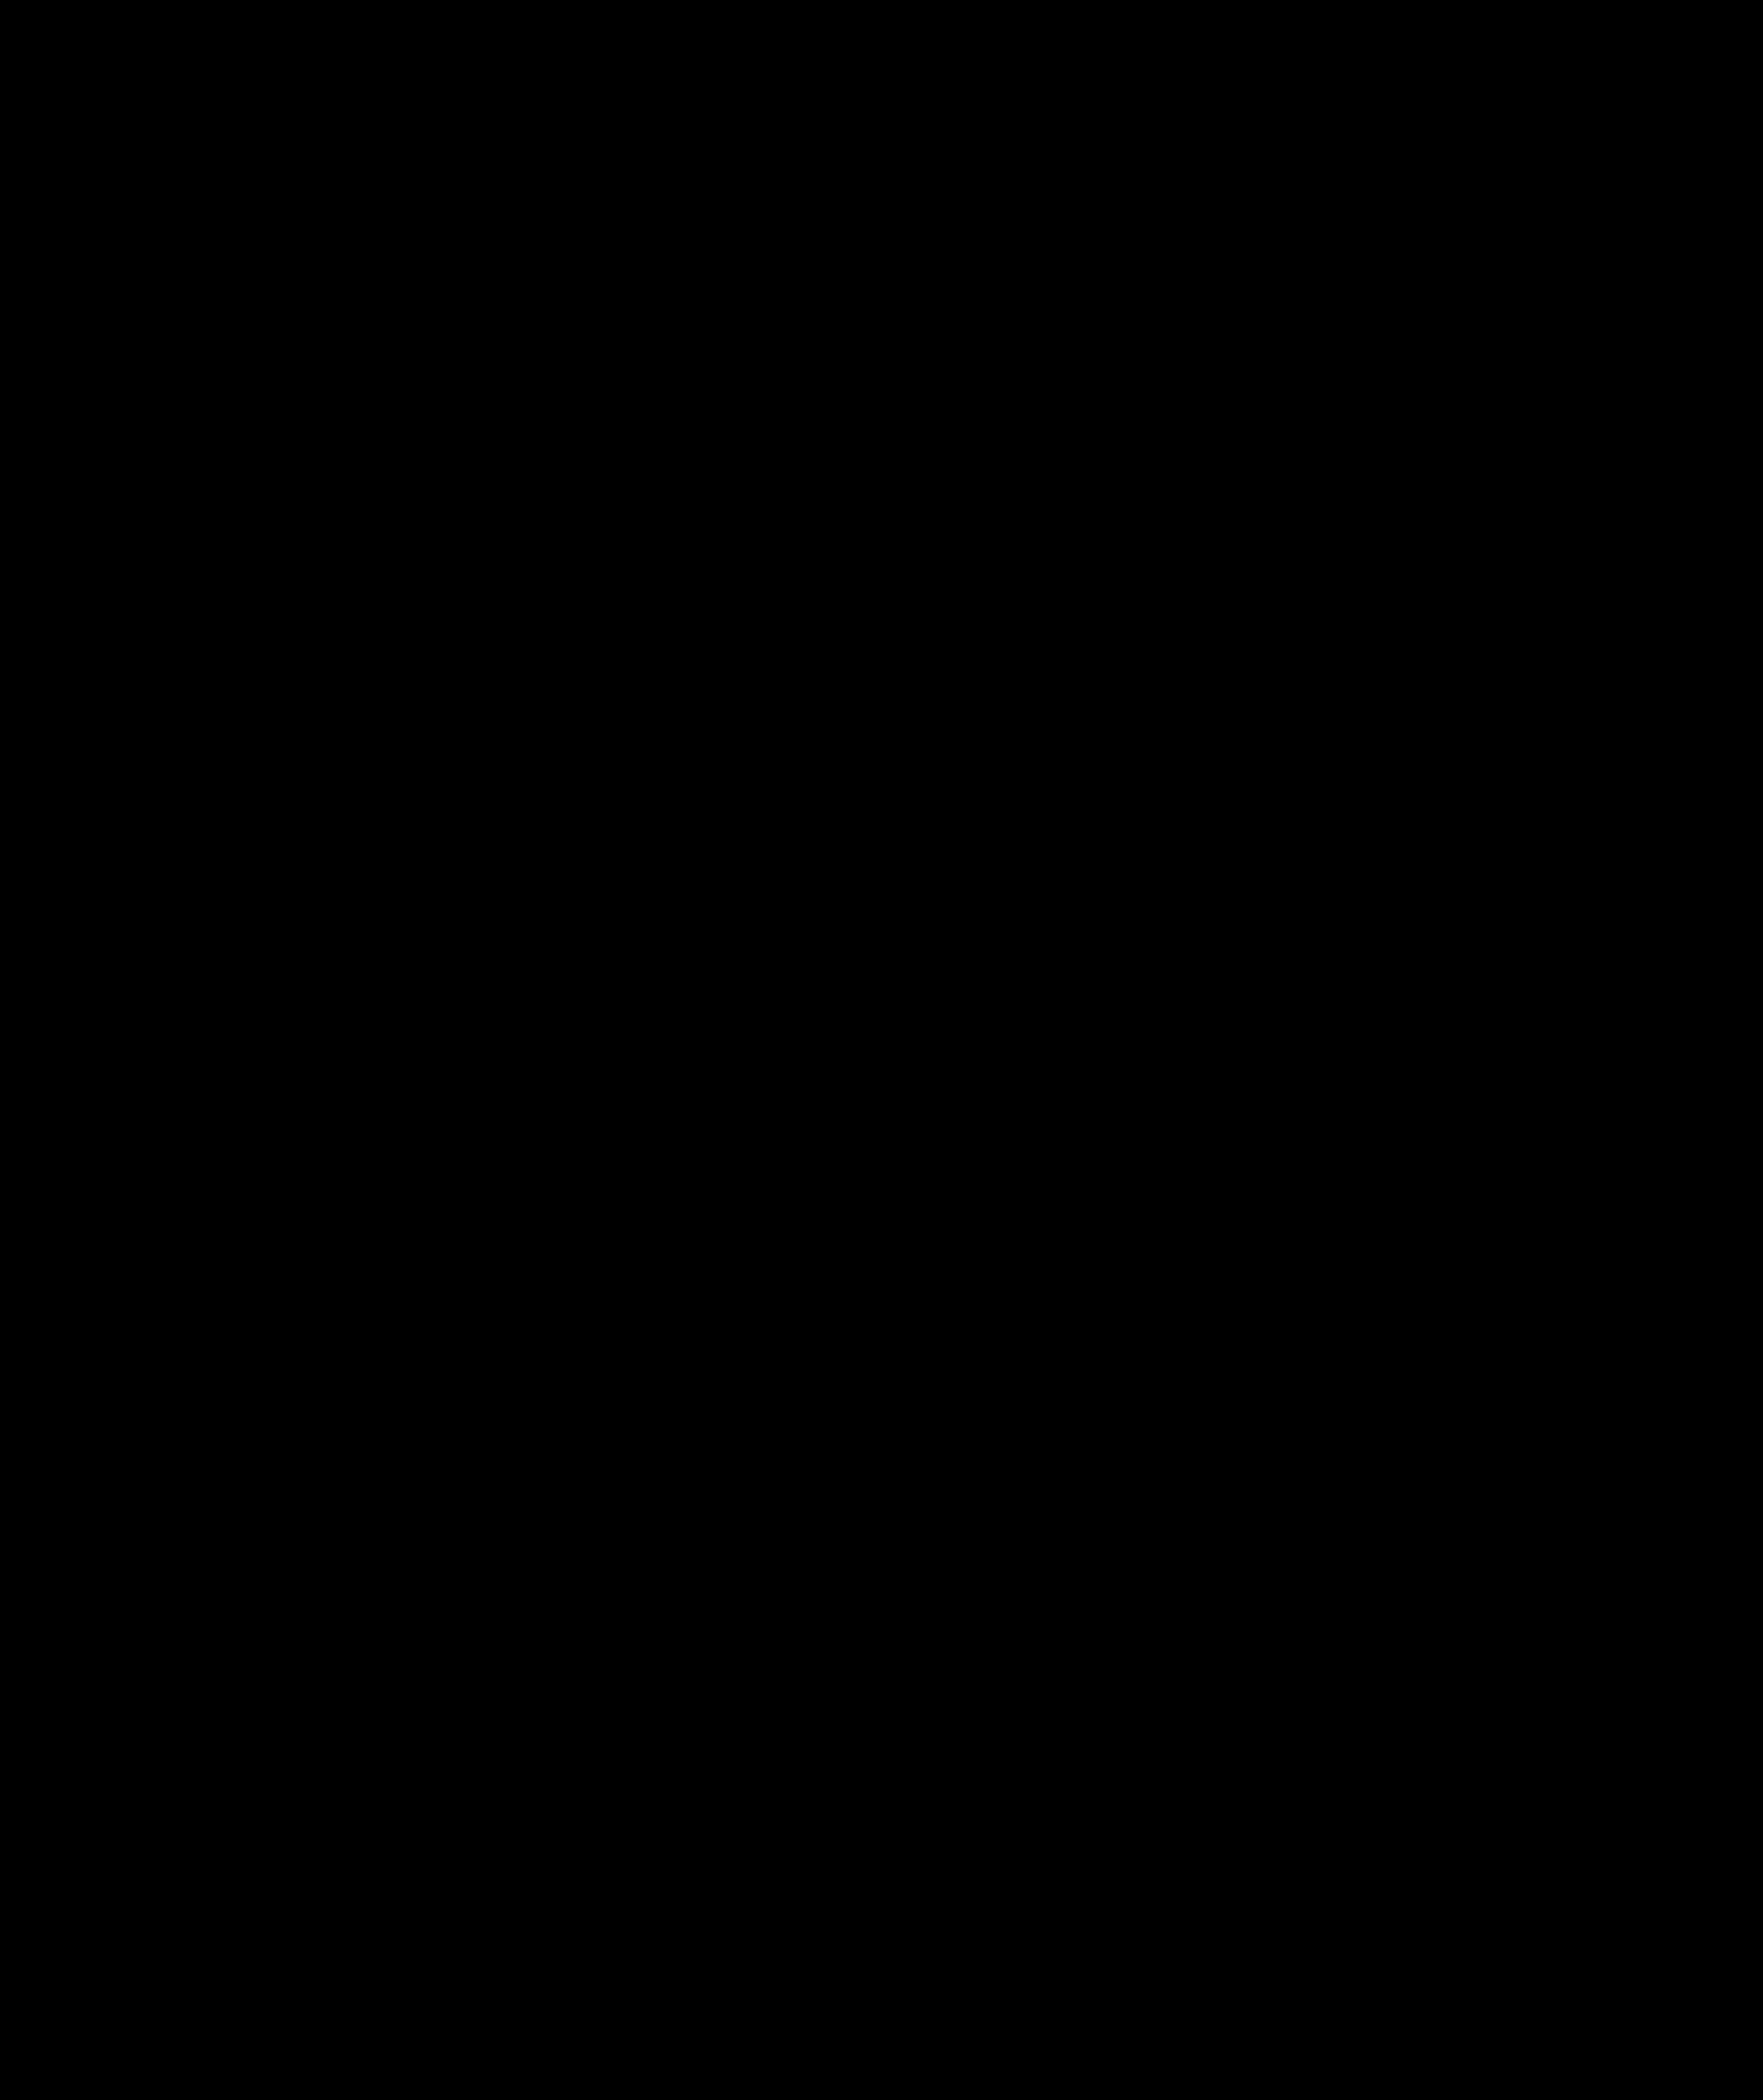 White apple logo clipart vector transparent library File:Apple Logo.svg - Wikimedia Commons vector transparent library